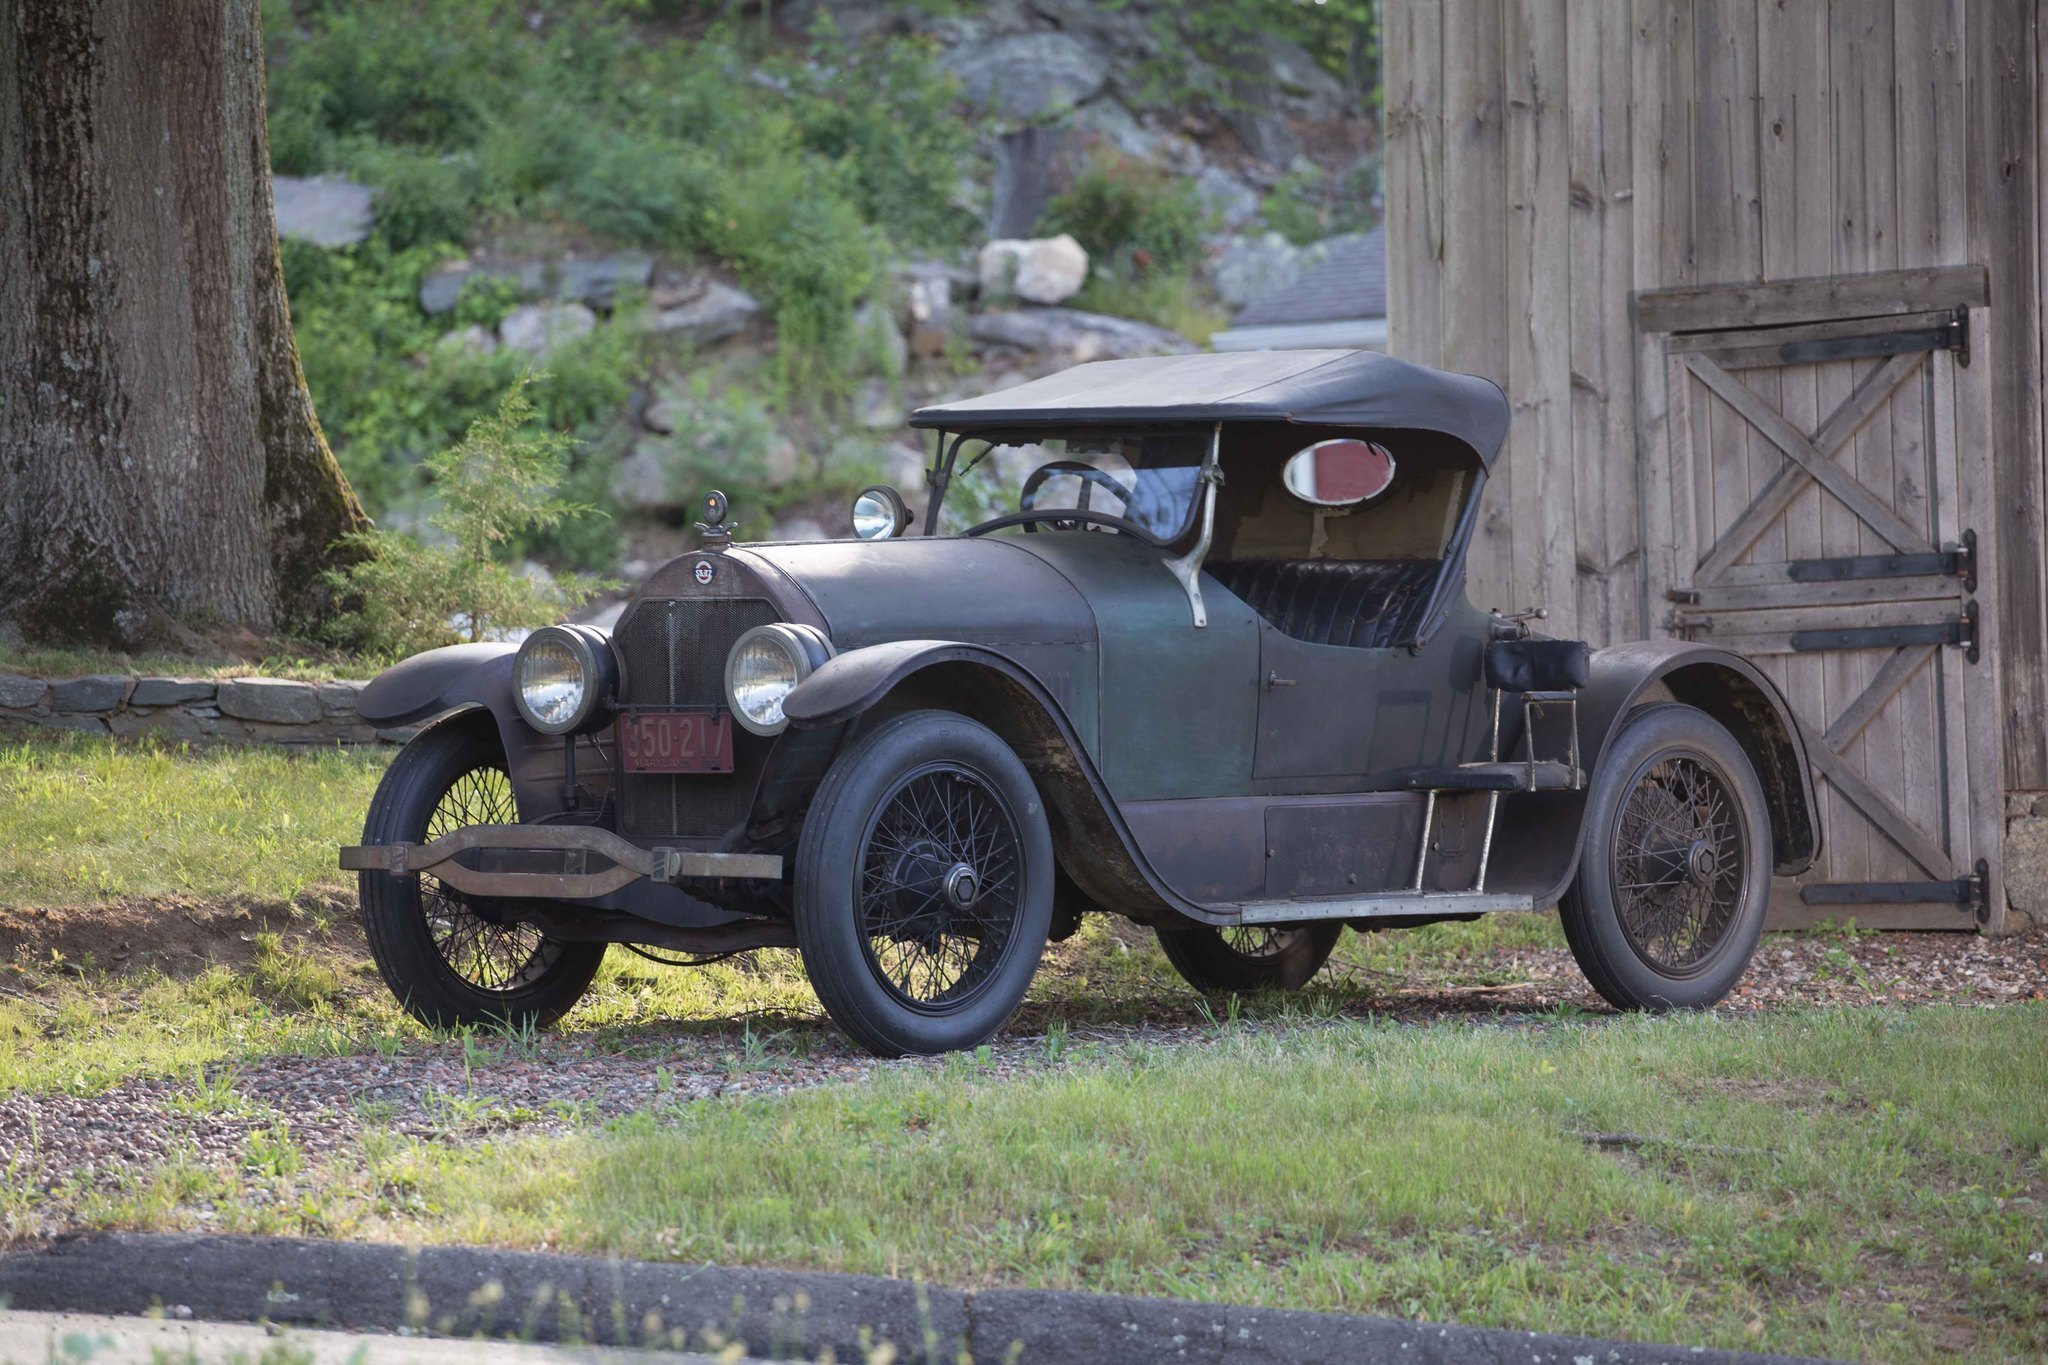 Stutz Bearcat Chasing Classic Cars